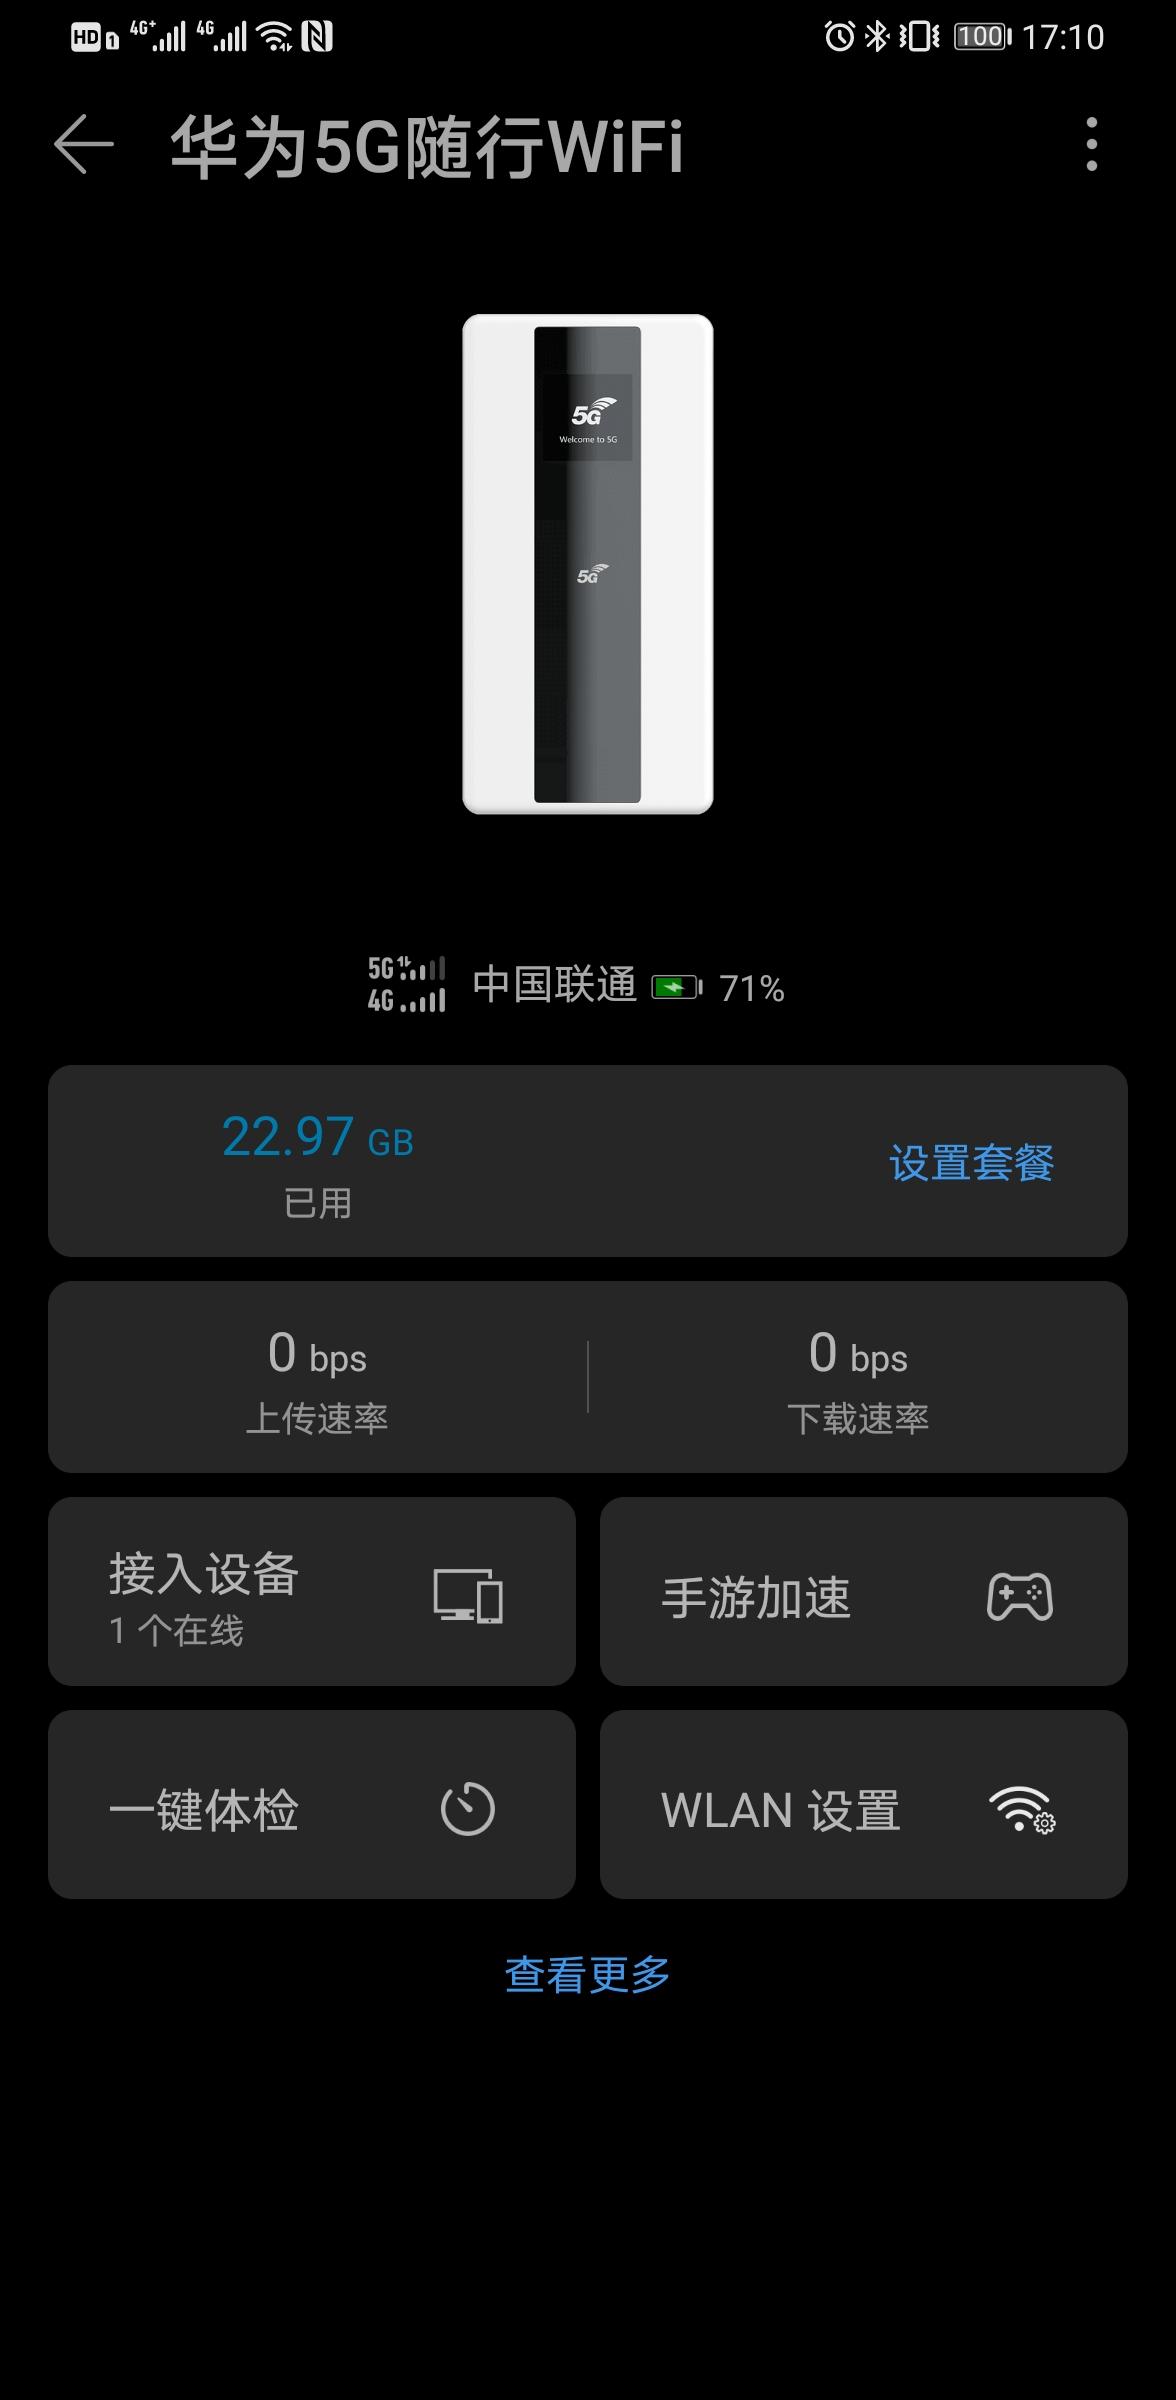 Screenshot_20200515_171000_com.huawei.smarthome.jpg